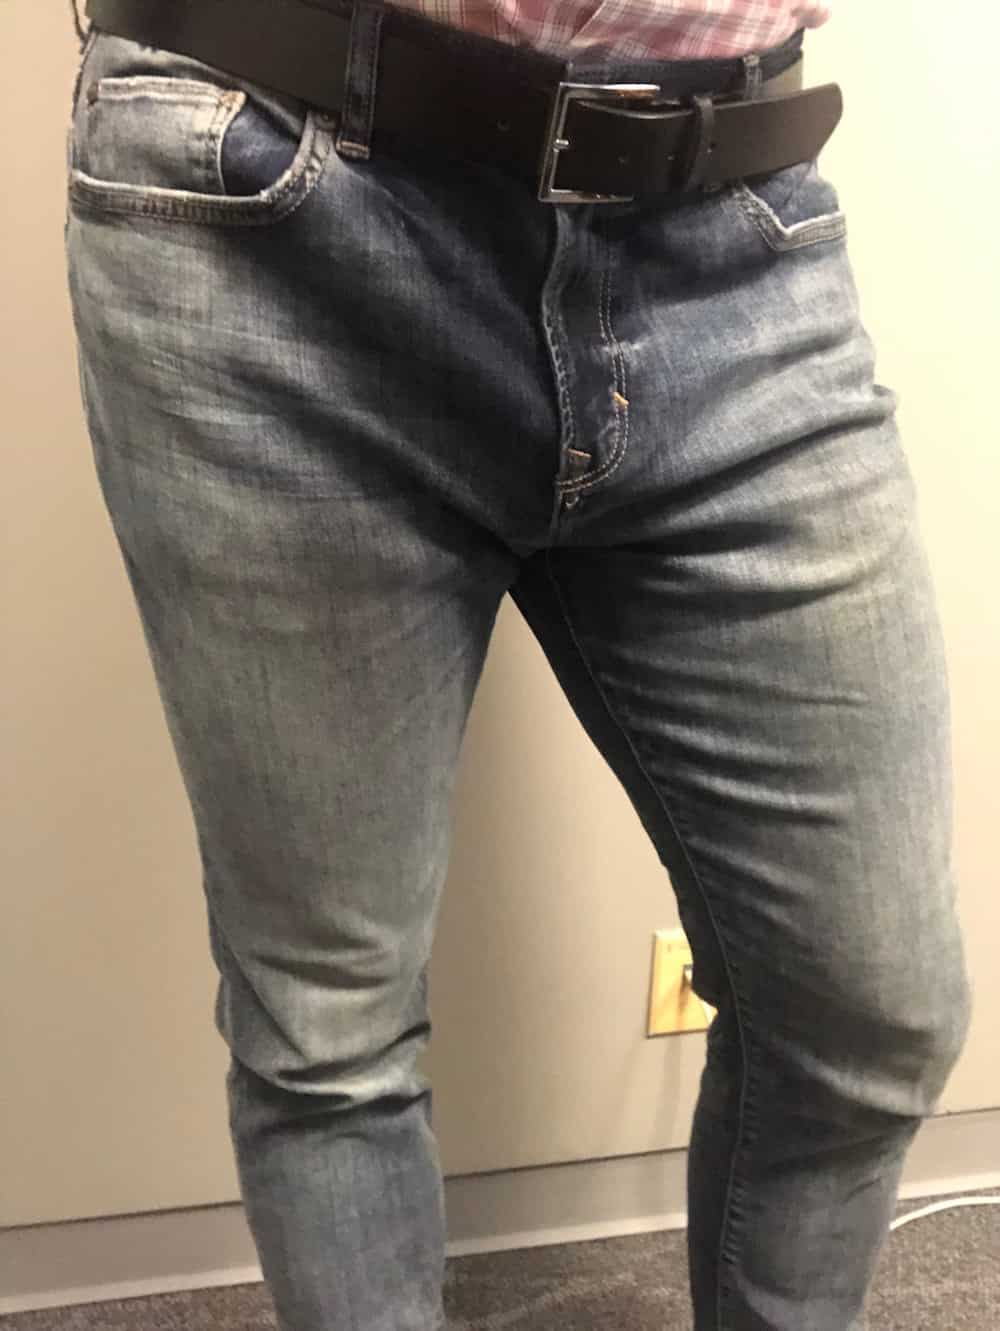 Banana Republic Slim Fit jeans for men photo